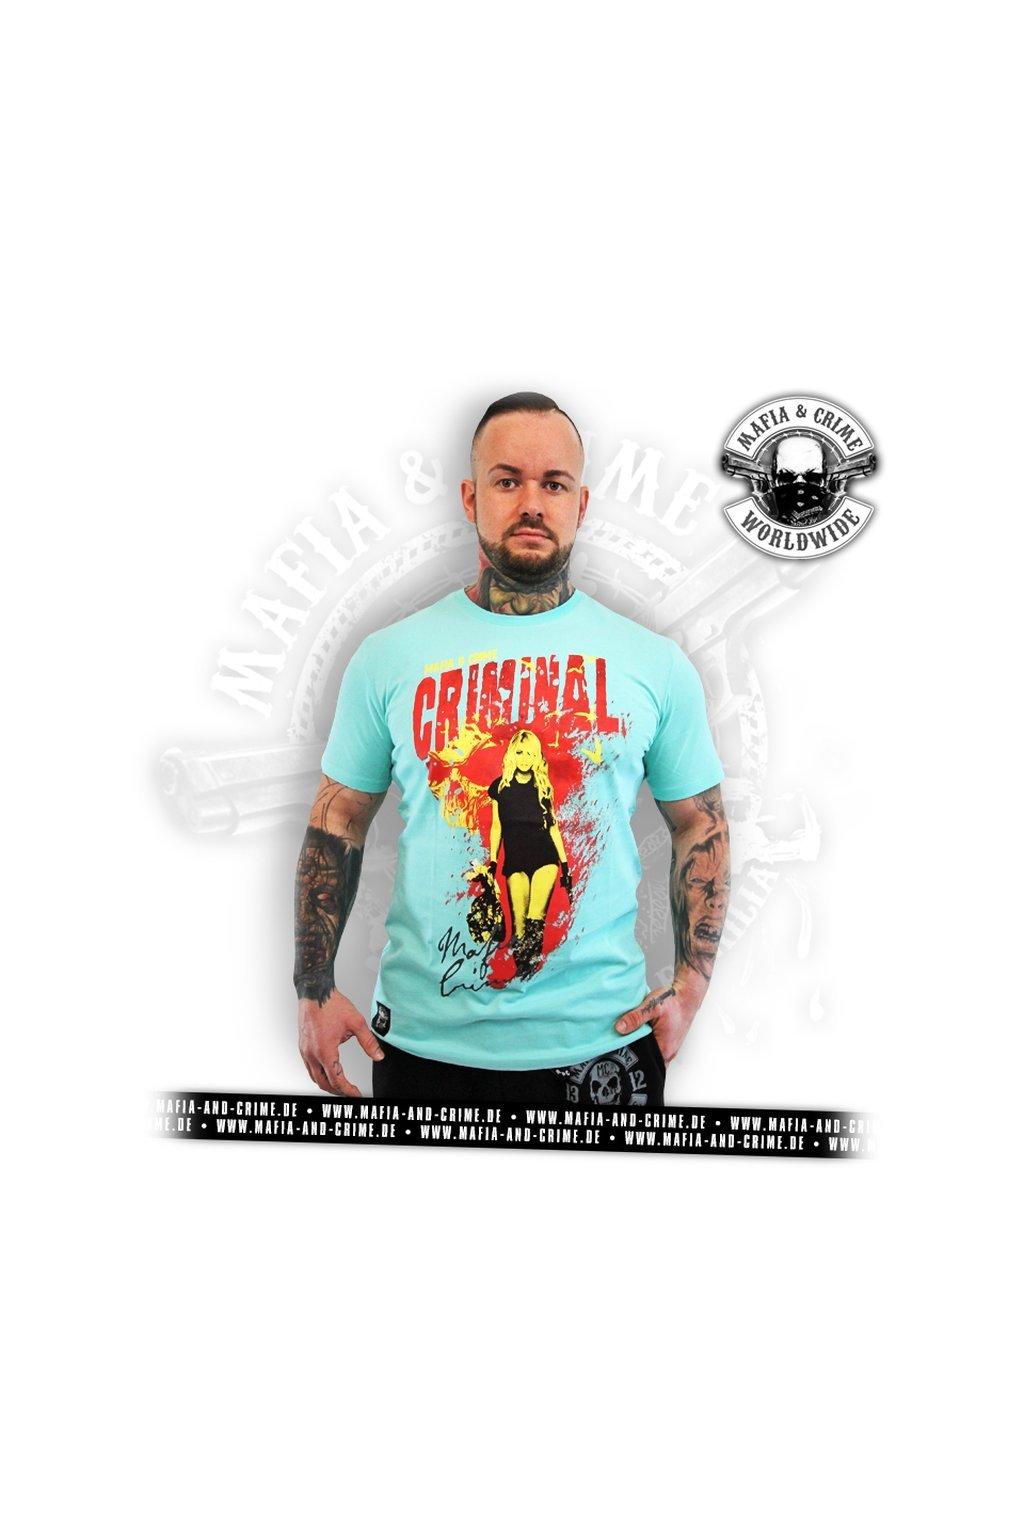 Pánské triko Mafia & Crime Criminal Lady Shirt turkis obr1